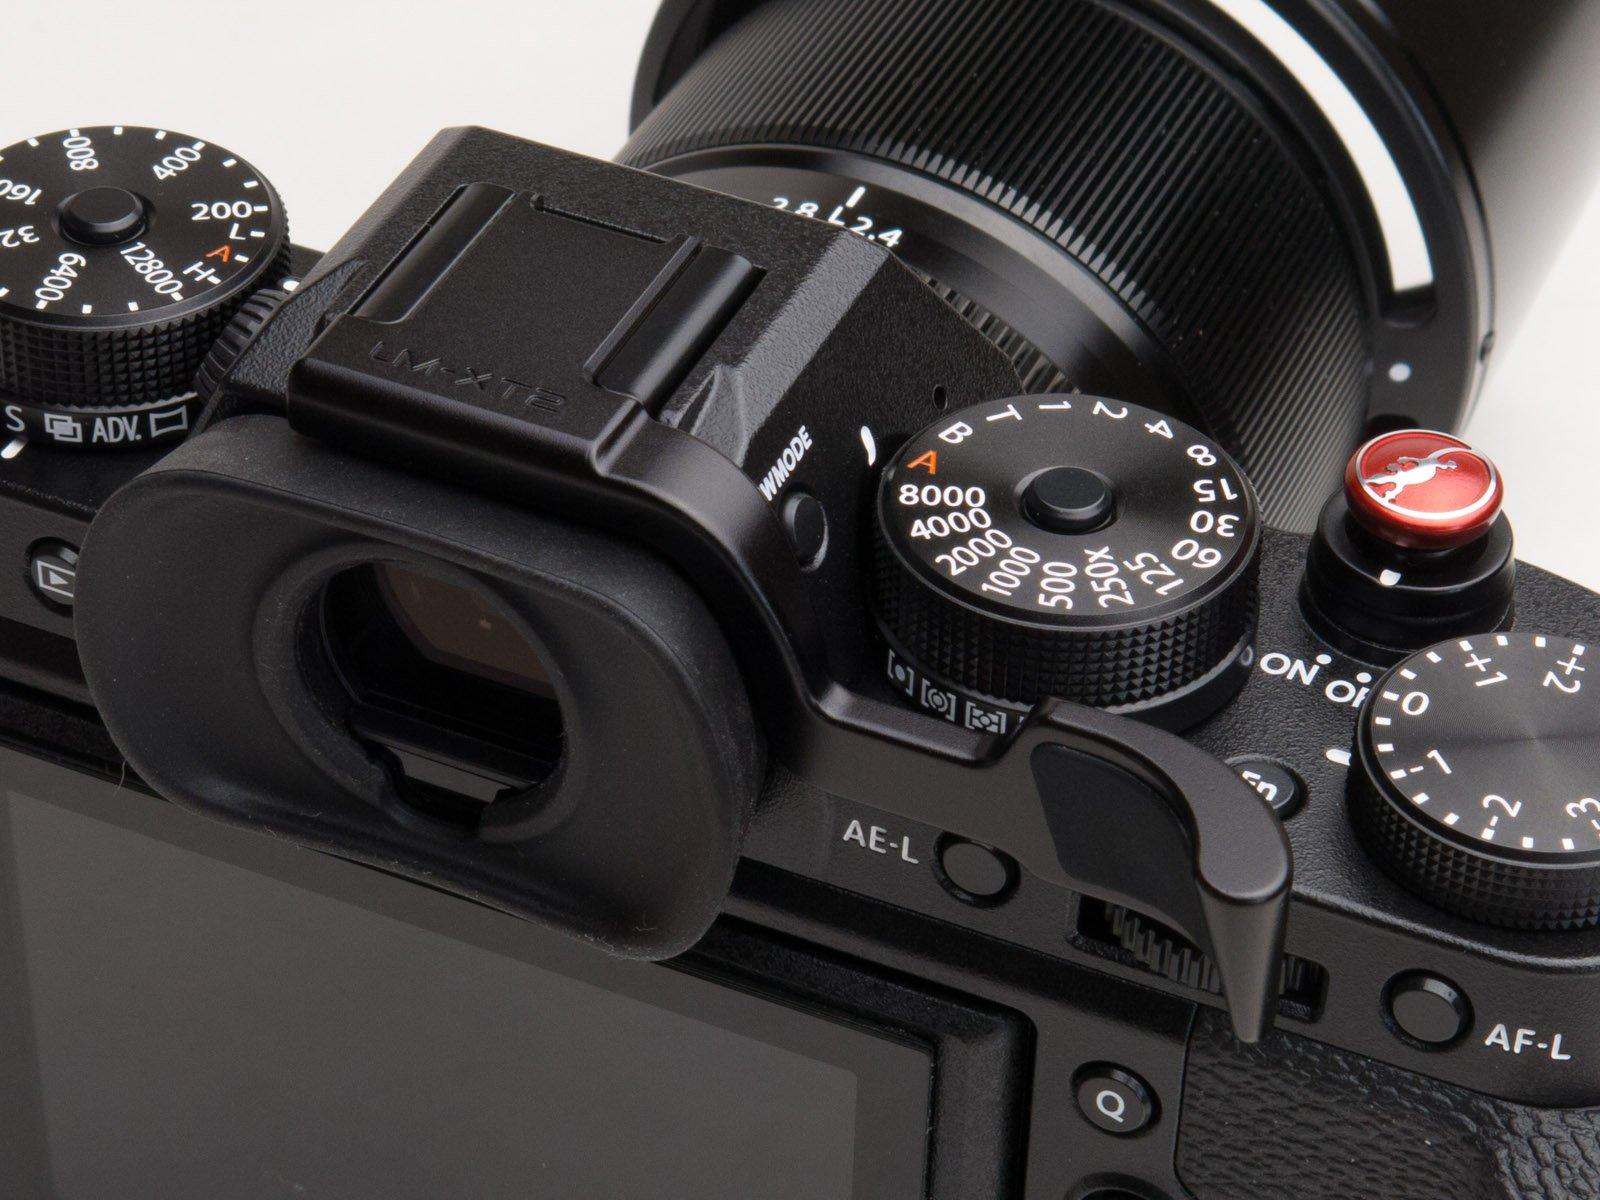 Lensmate Thumb Grip for Fujifilm X-T2 (also fits X-T1) - Black